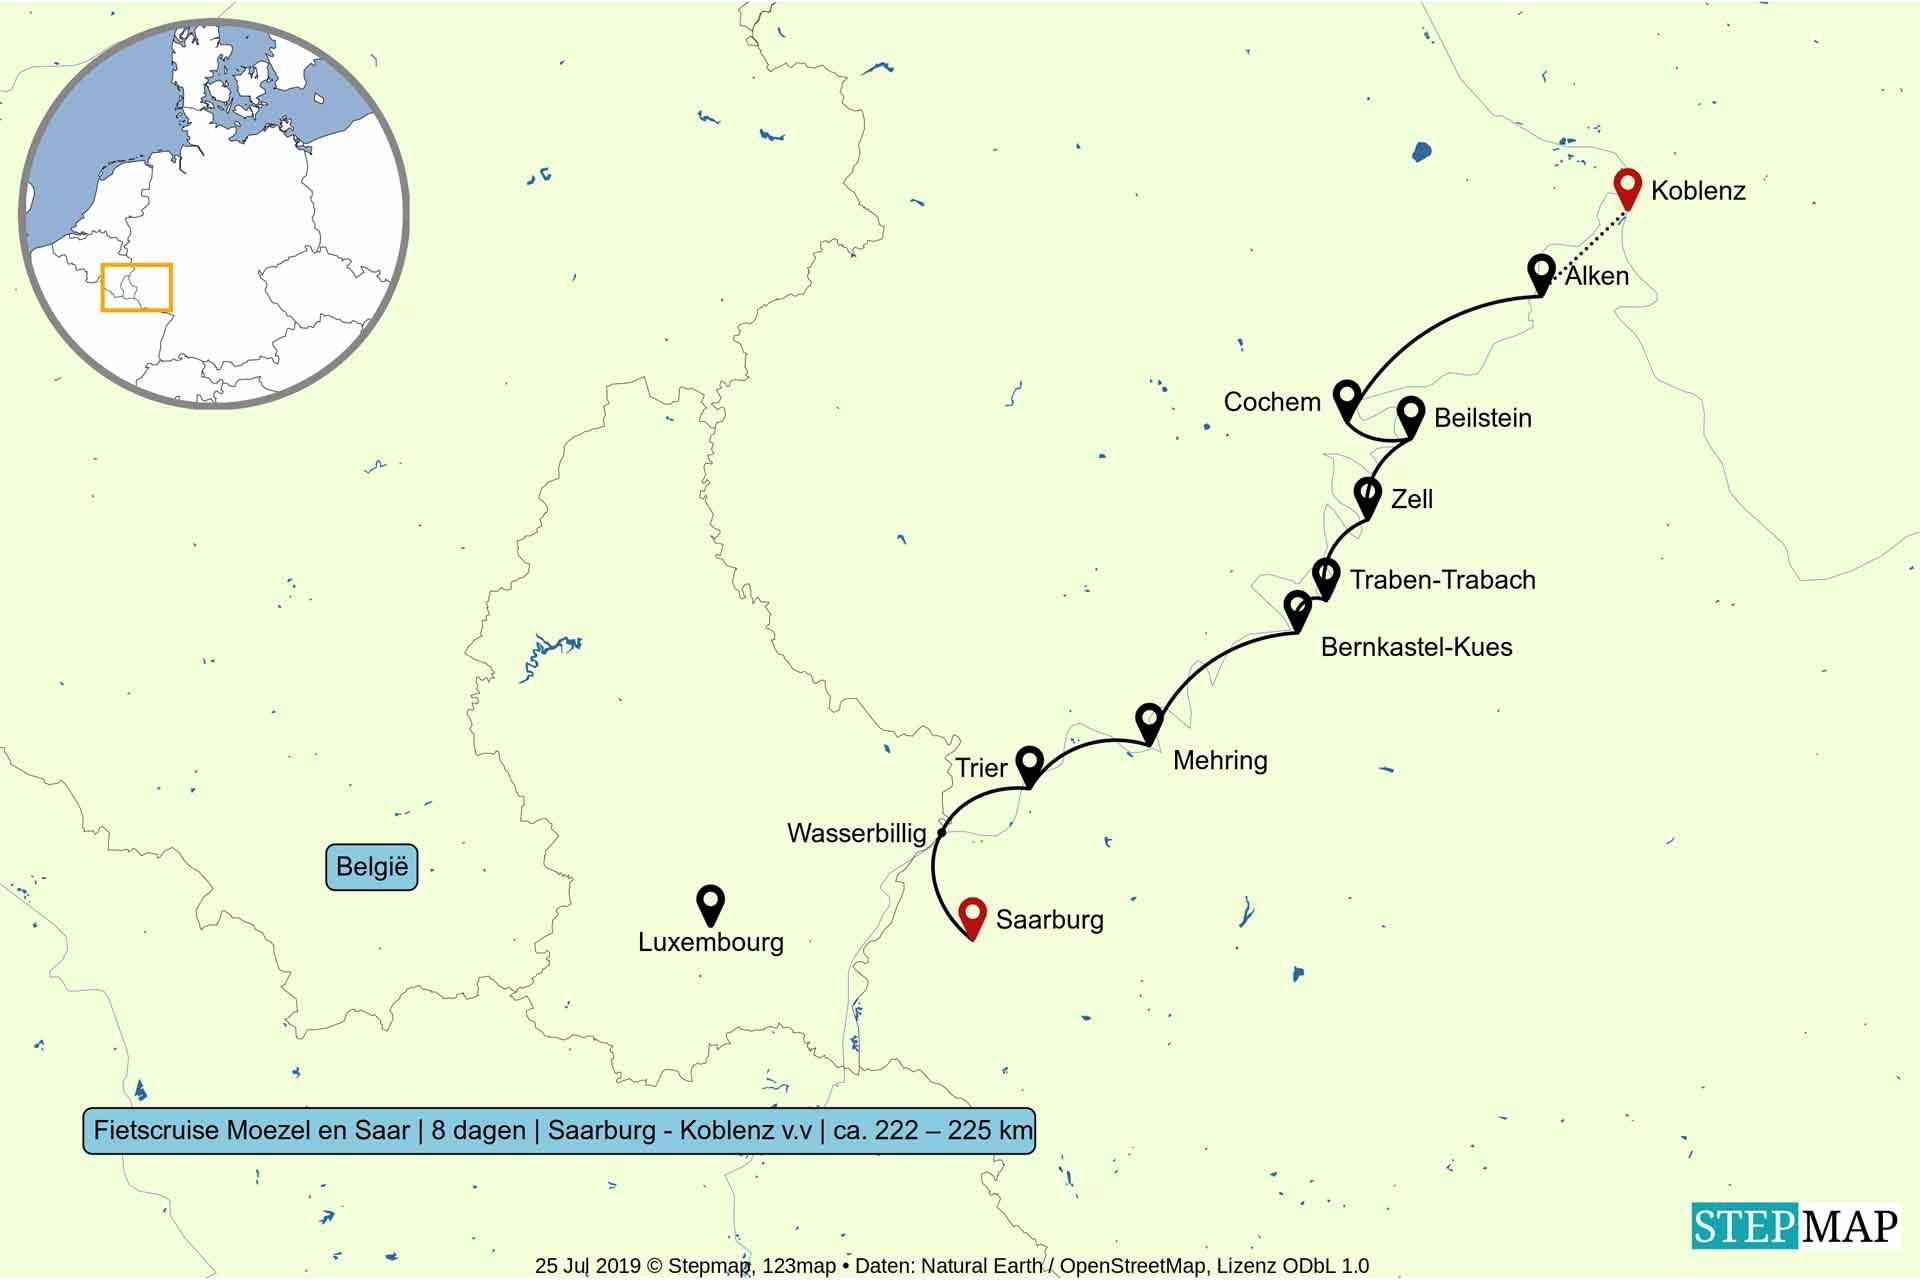 Route van de fietscruise op Moezel en Saar - Saarburg - Koblenz v.v.